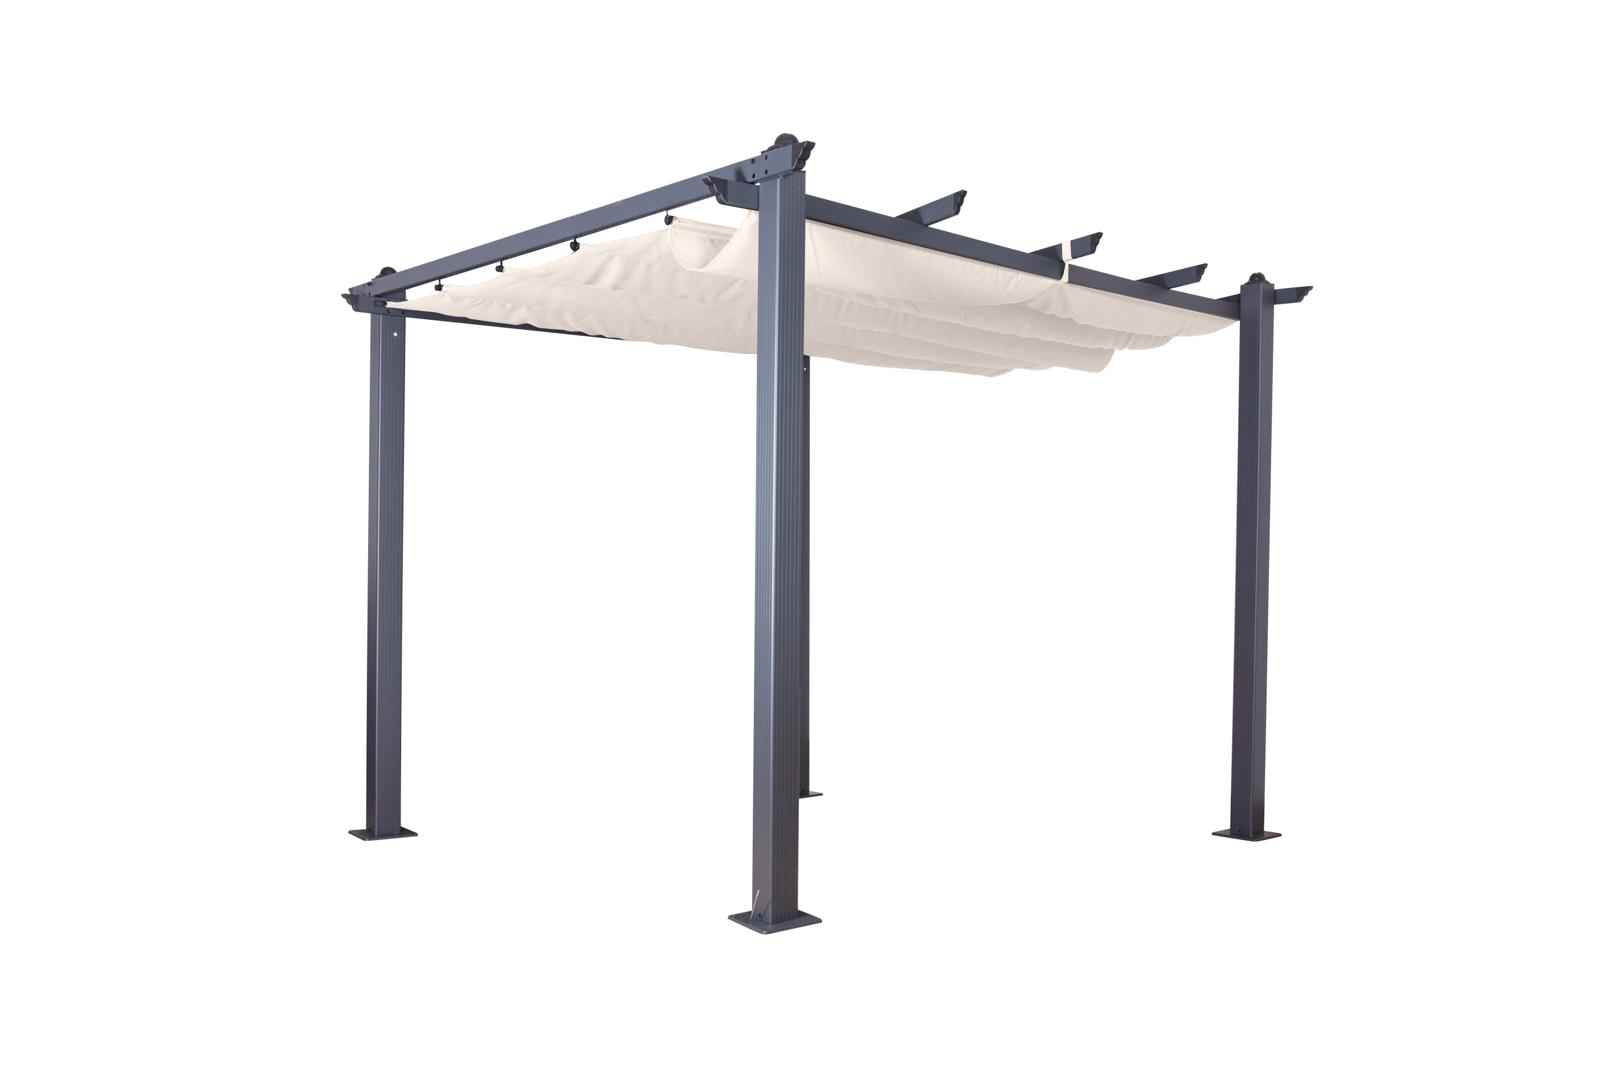 pavillon kairo 3 x 3 pergola sonnenschutz dach terasse. Black Bedroom Furniture Sets. Home Design Ideas